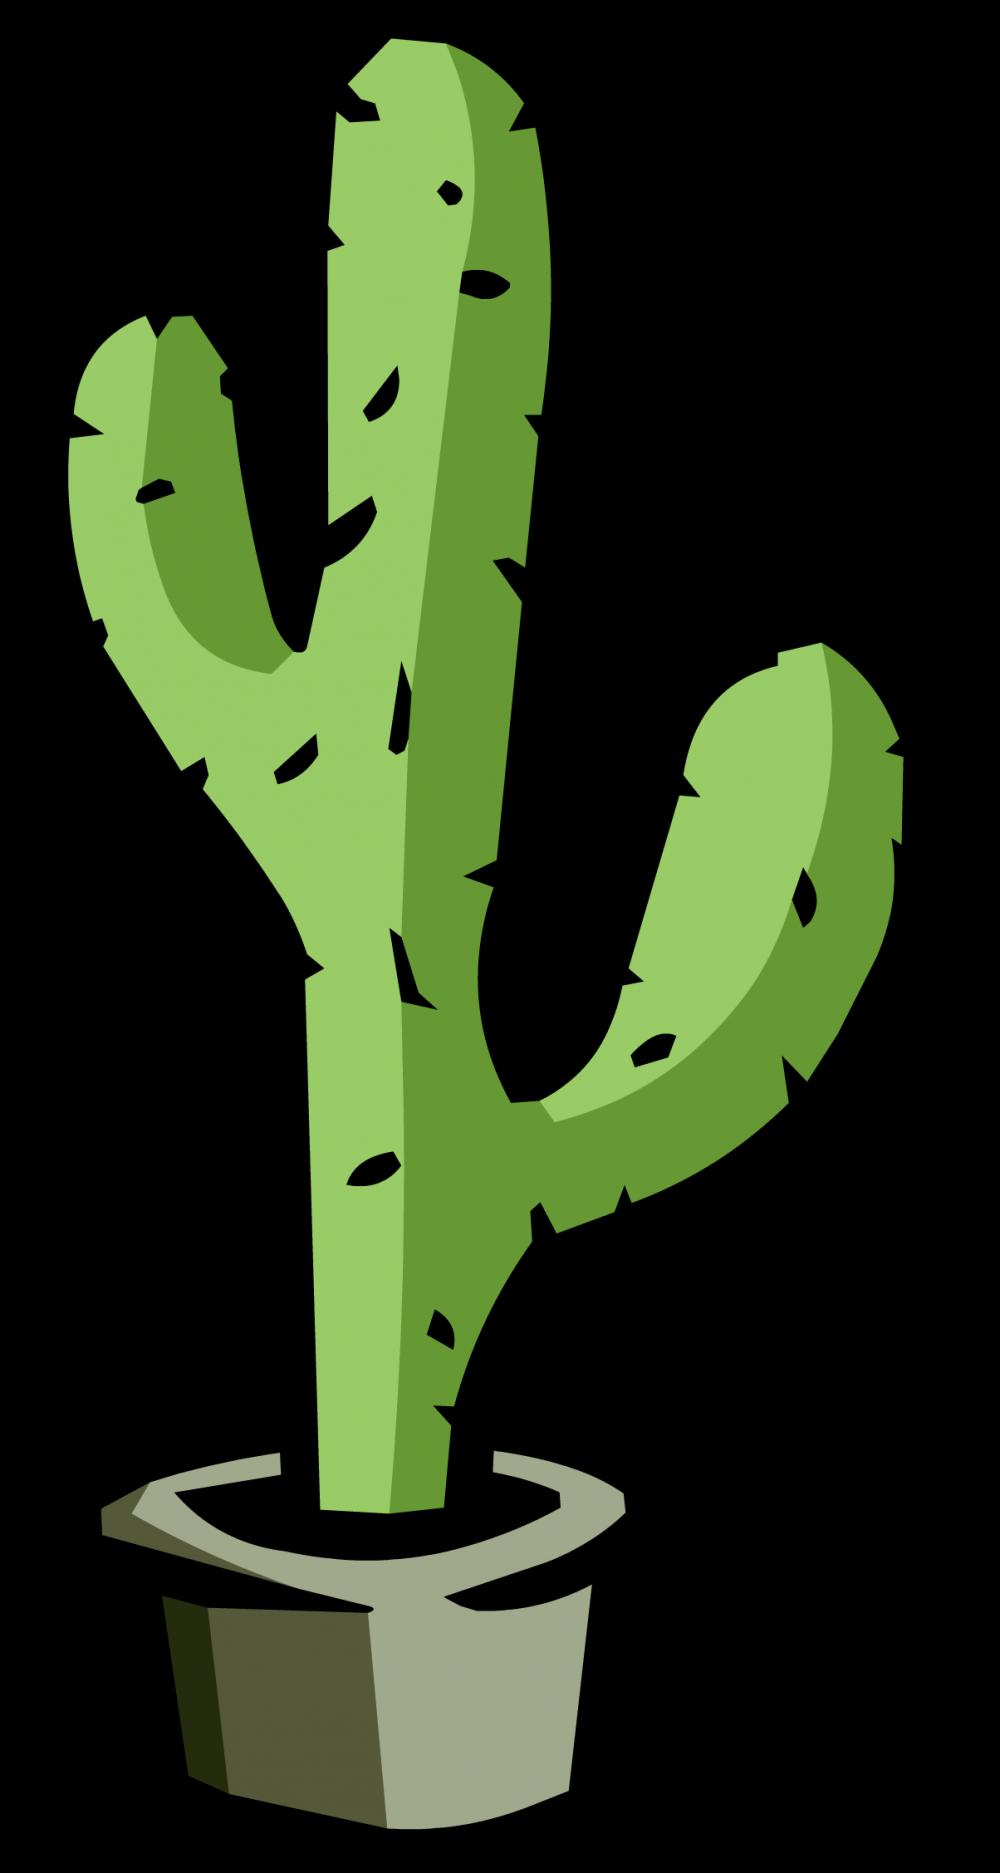 Download png for designing. Cactus clipart transparent background